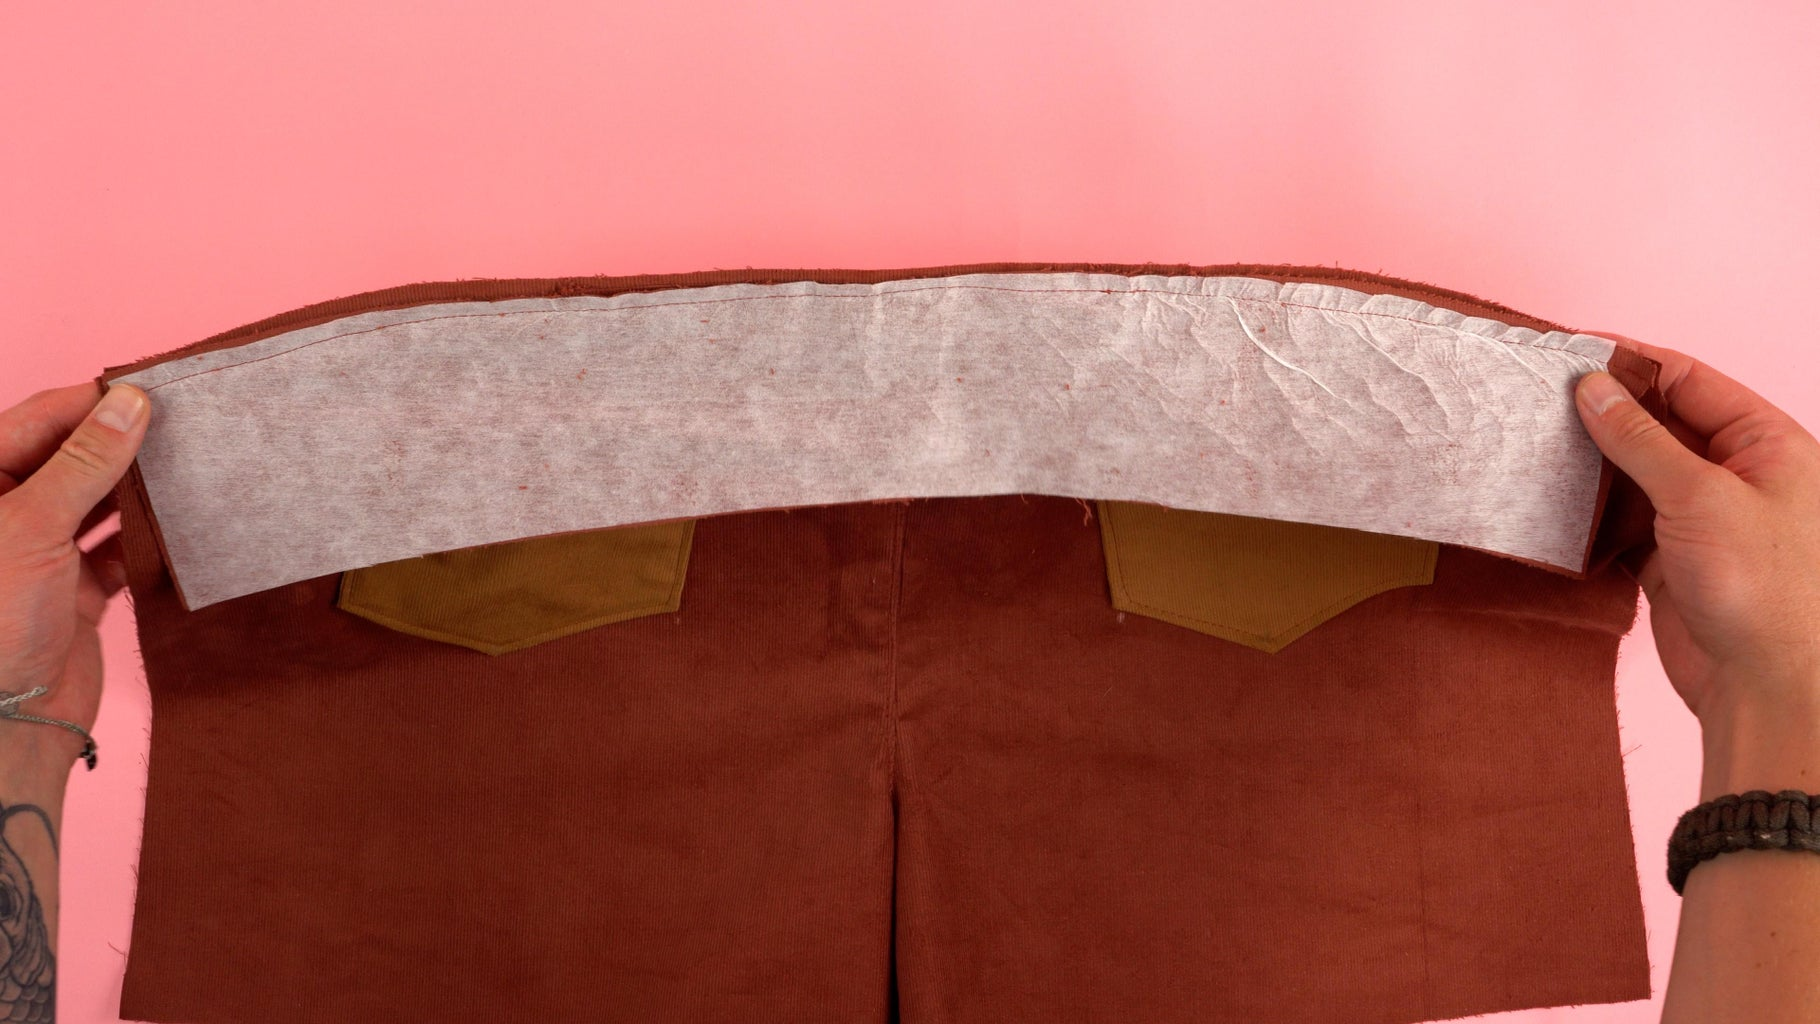 Attaching Waistband Back Panels